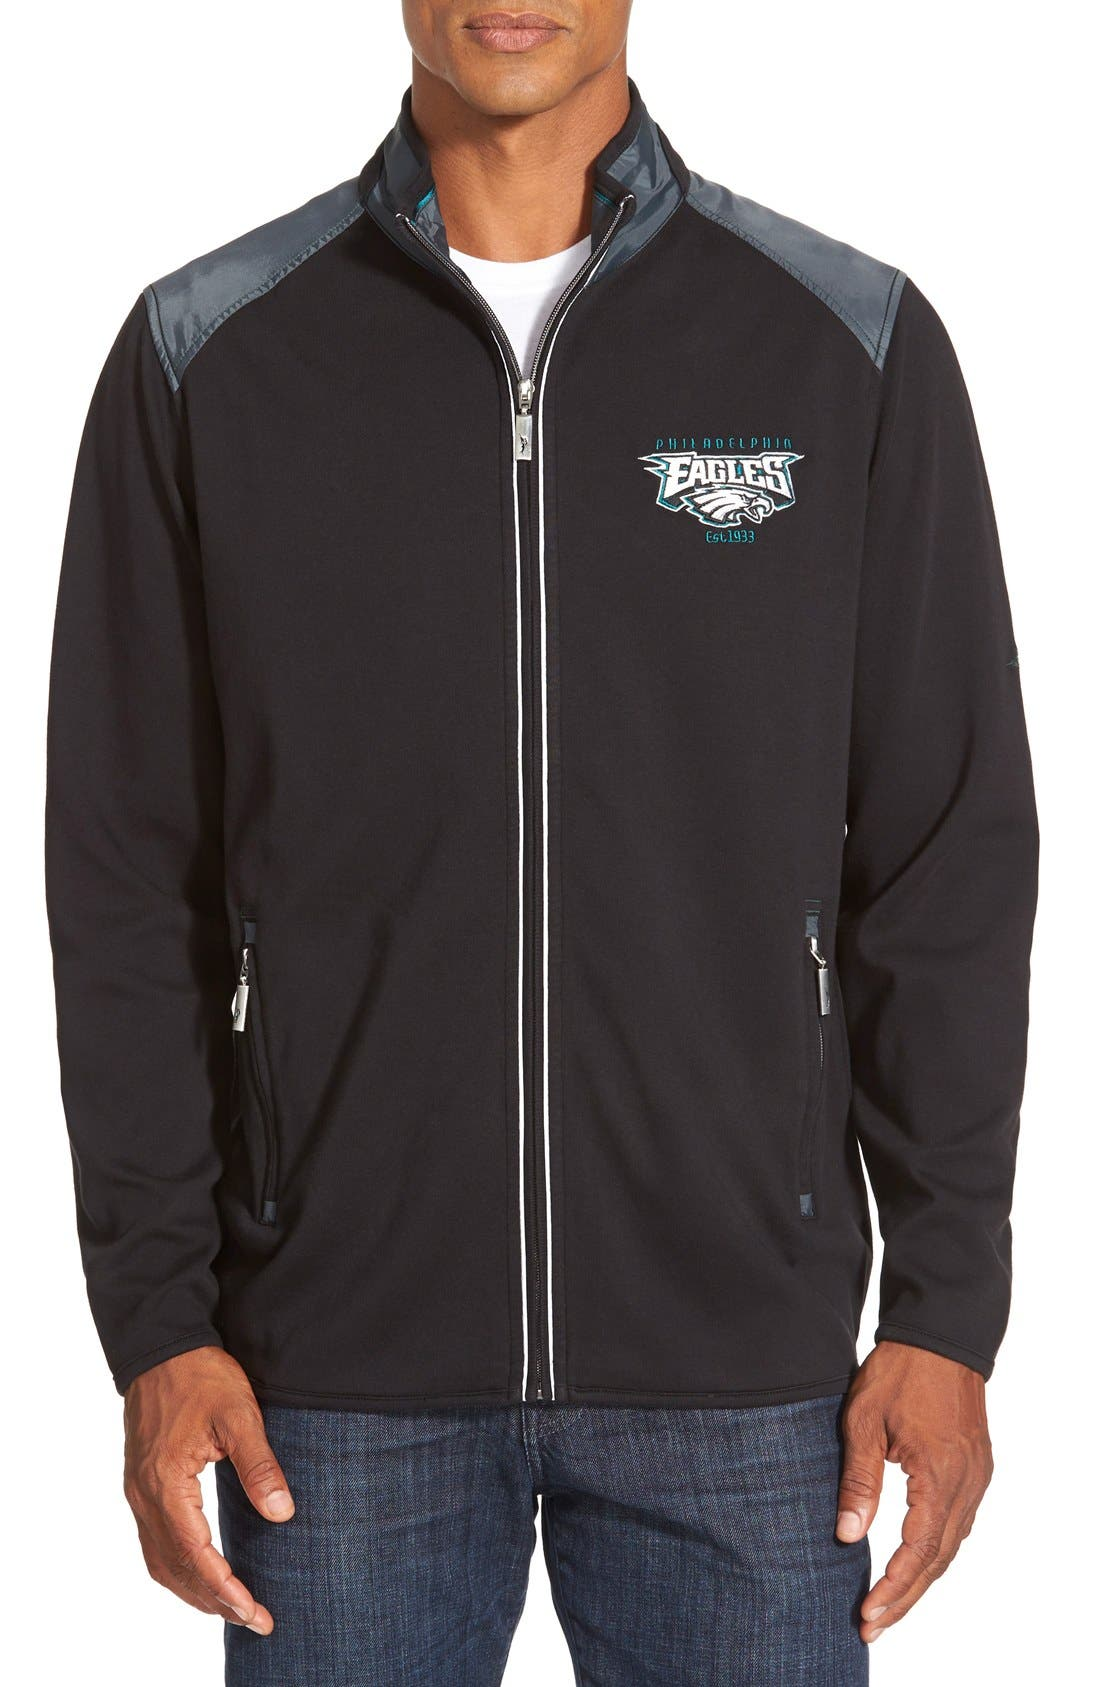 TOMMY BAHAMA,                             'Goal Line - Baltimore Ravens' NFL Full Zip Jacket,                             Main thumbnail 1, color,                             001